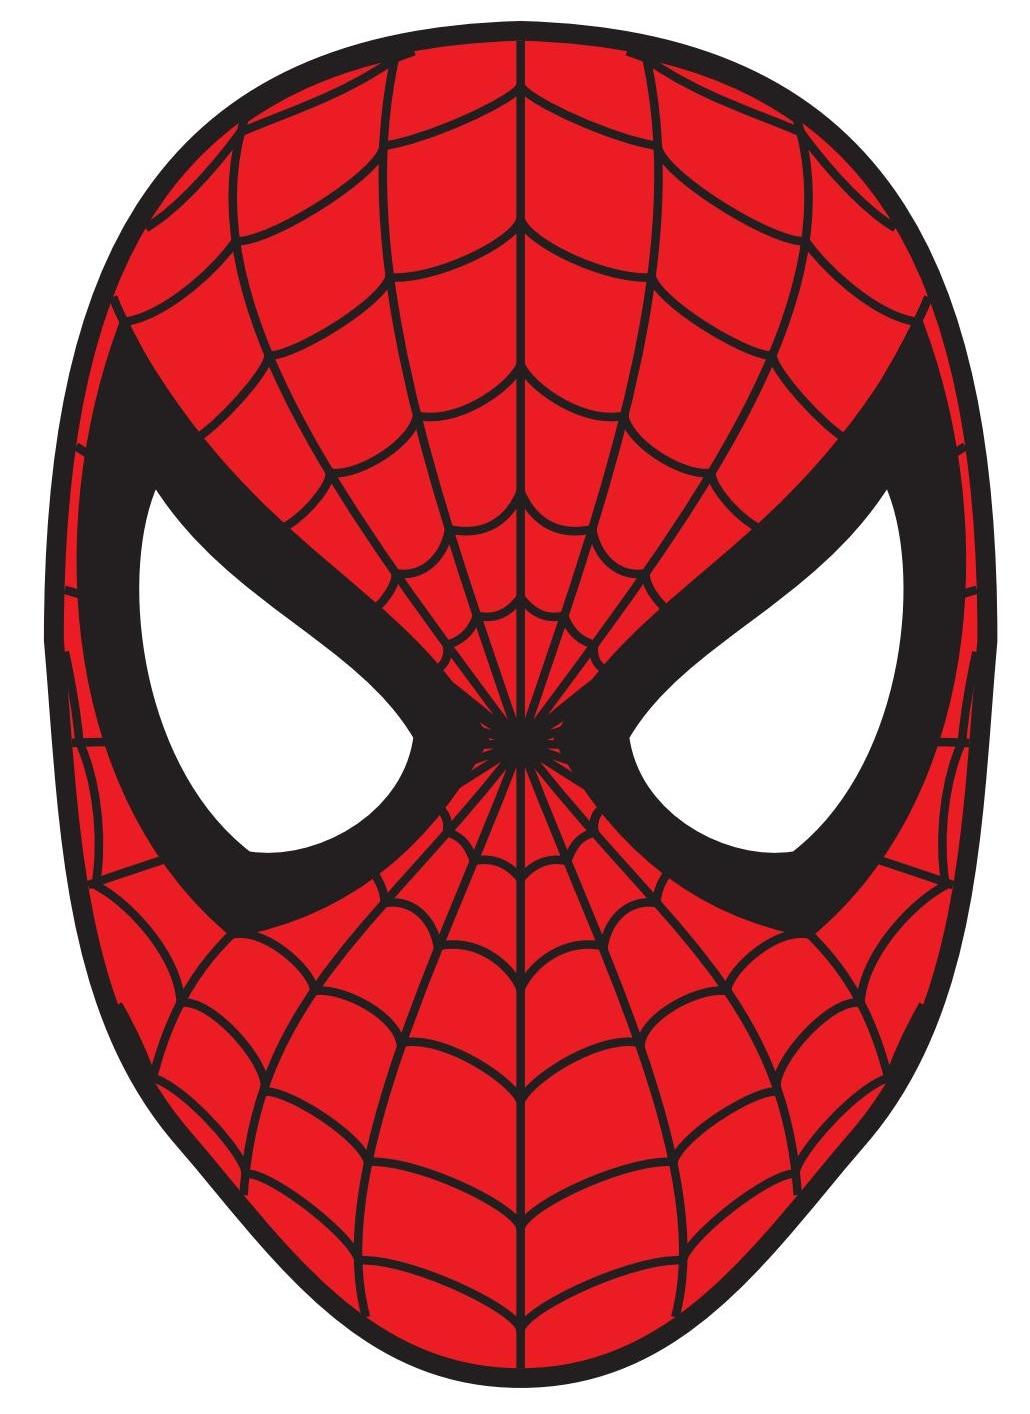 spiderman clipart pdf clipground spiderman logo drawing step by step spiderman drawing logo